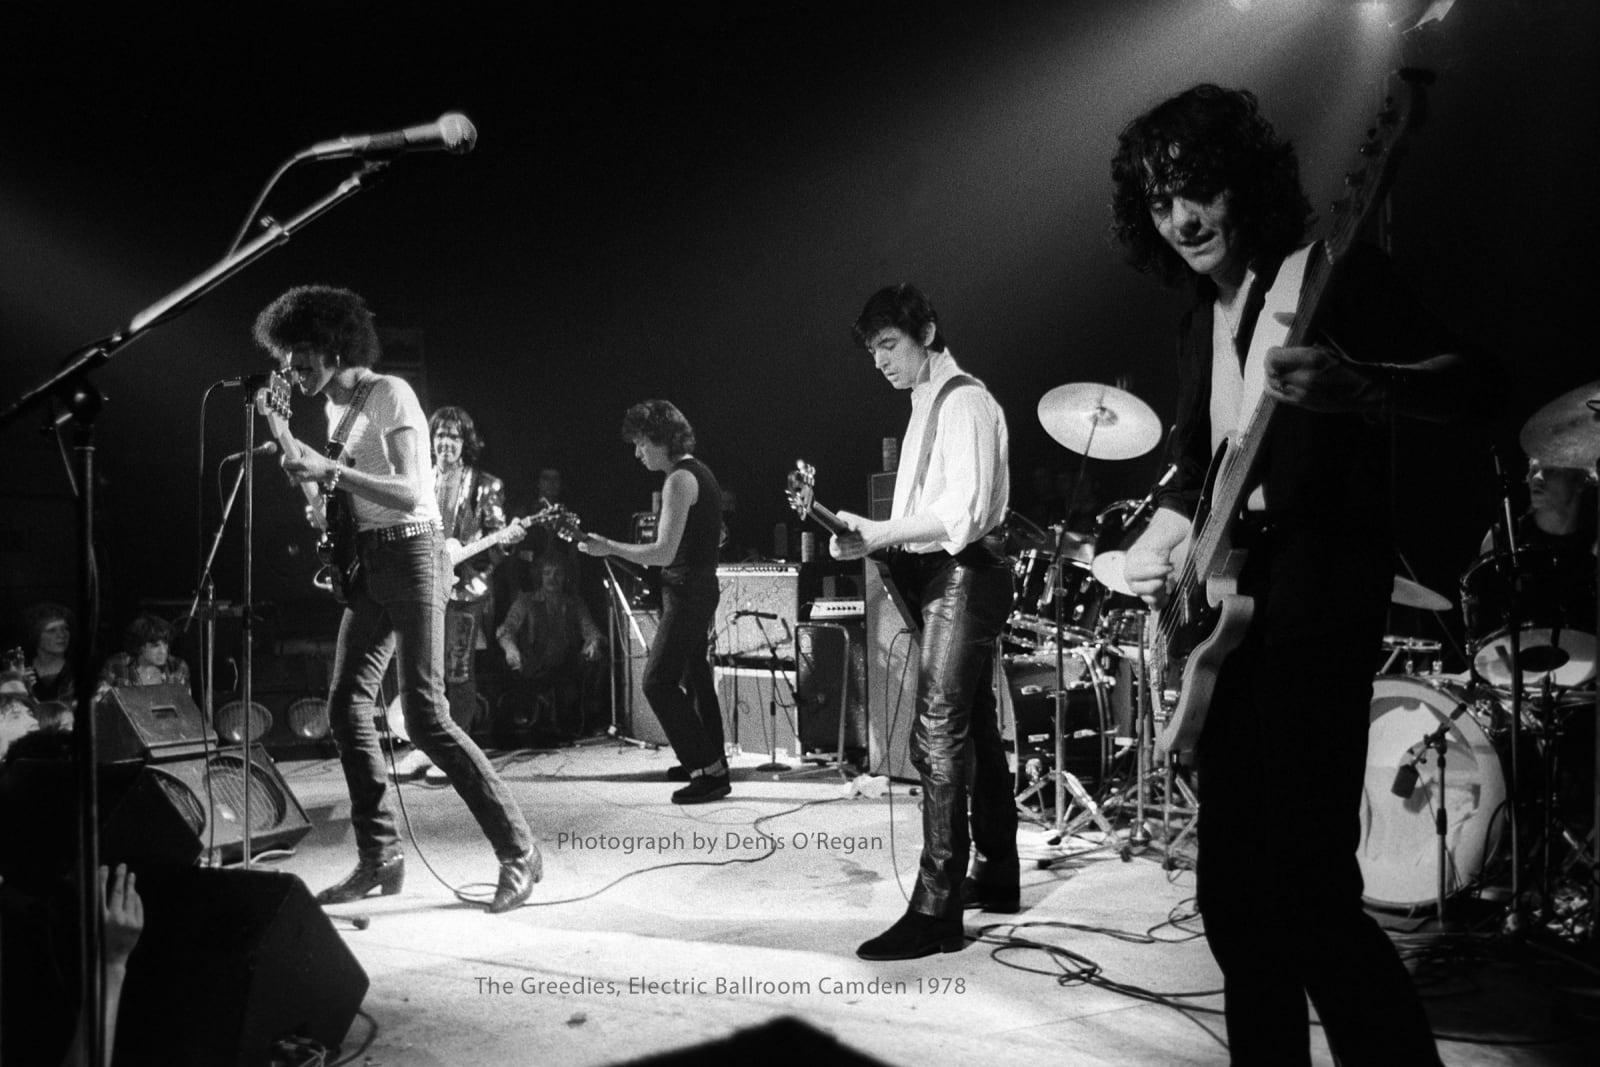 THIN LIZZY, The Greedies Camden Town, 1978